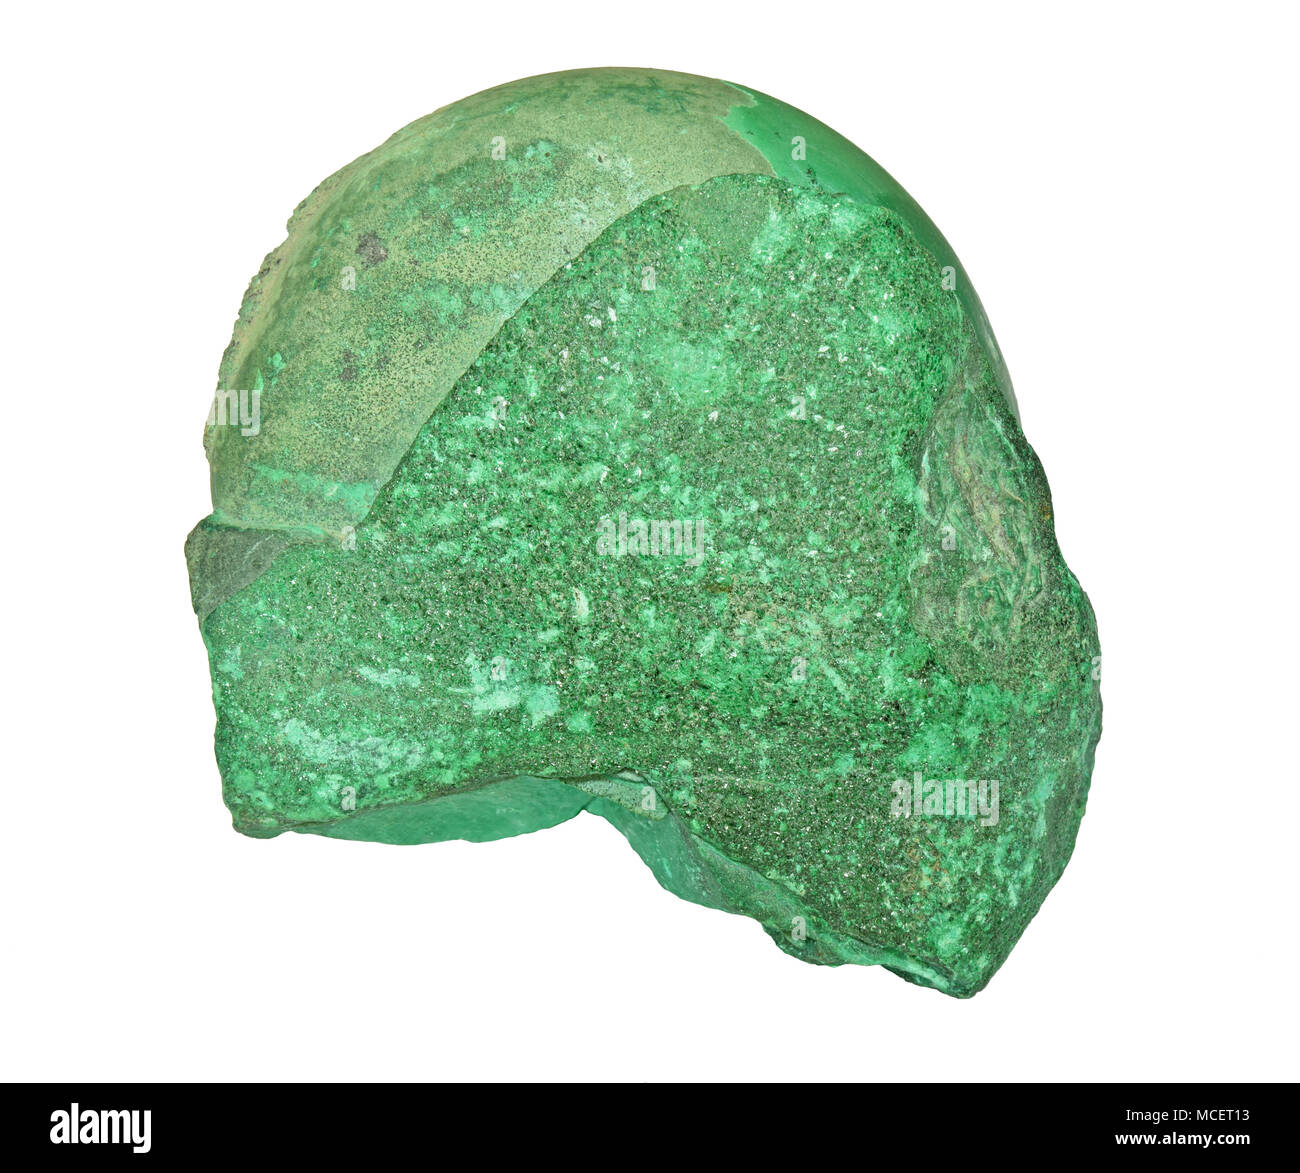 Raw specimen of a malachite stone on white background - Stock Image